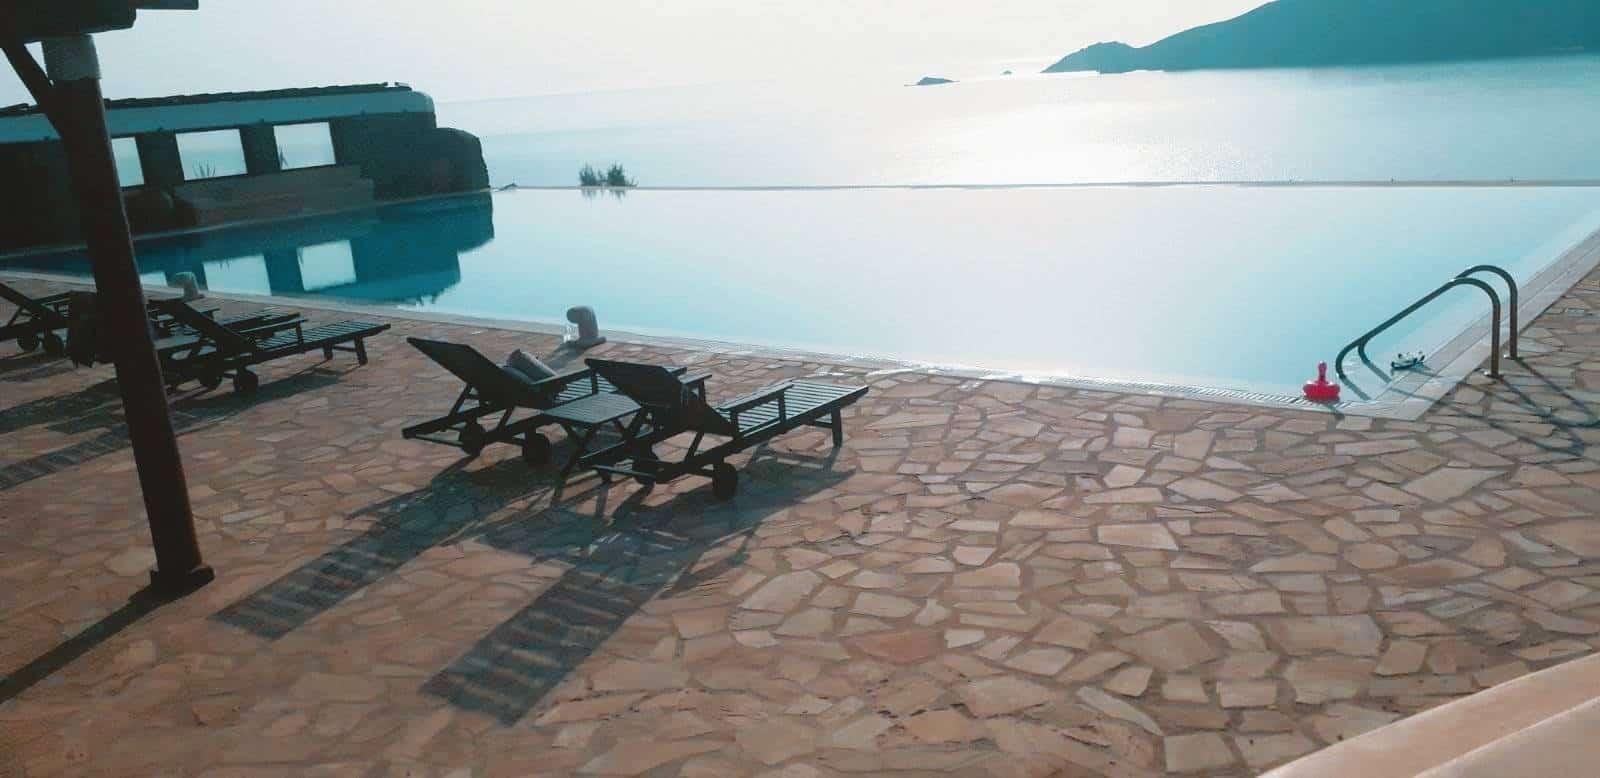 luxurious villa Mykonos - πολυτελής βίλα Μύκονος - mykonos services - οικοδομικές εργασίες 13